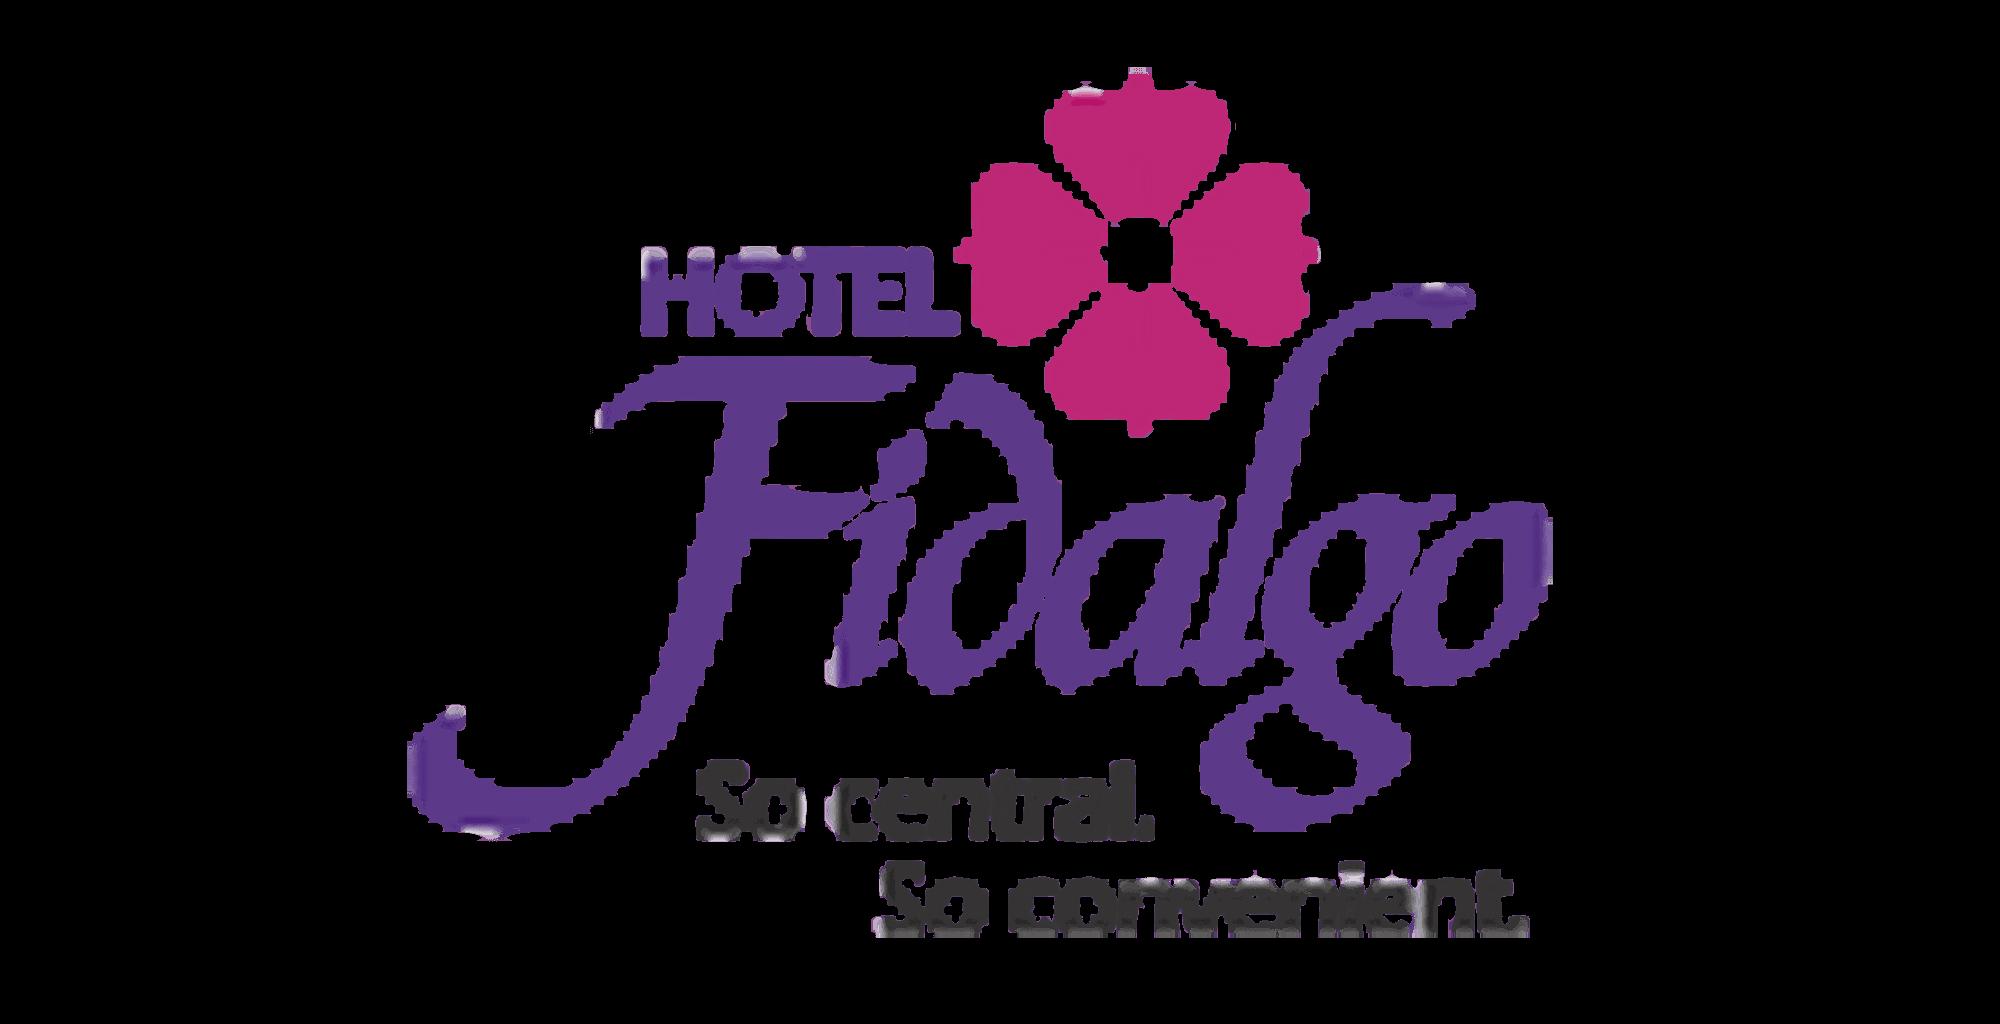 fidalgo hotel logo png